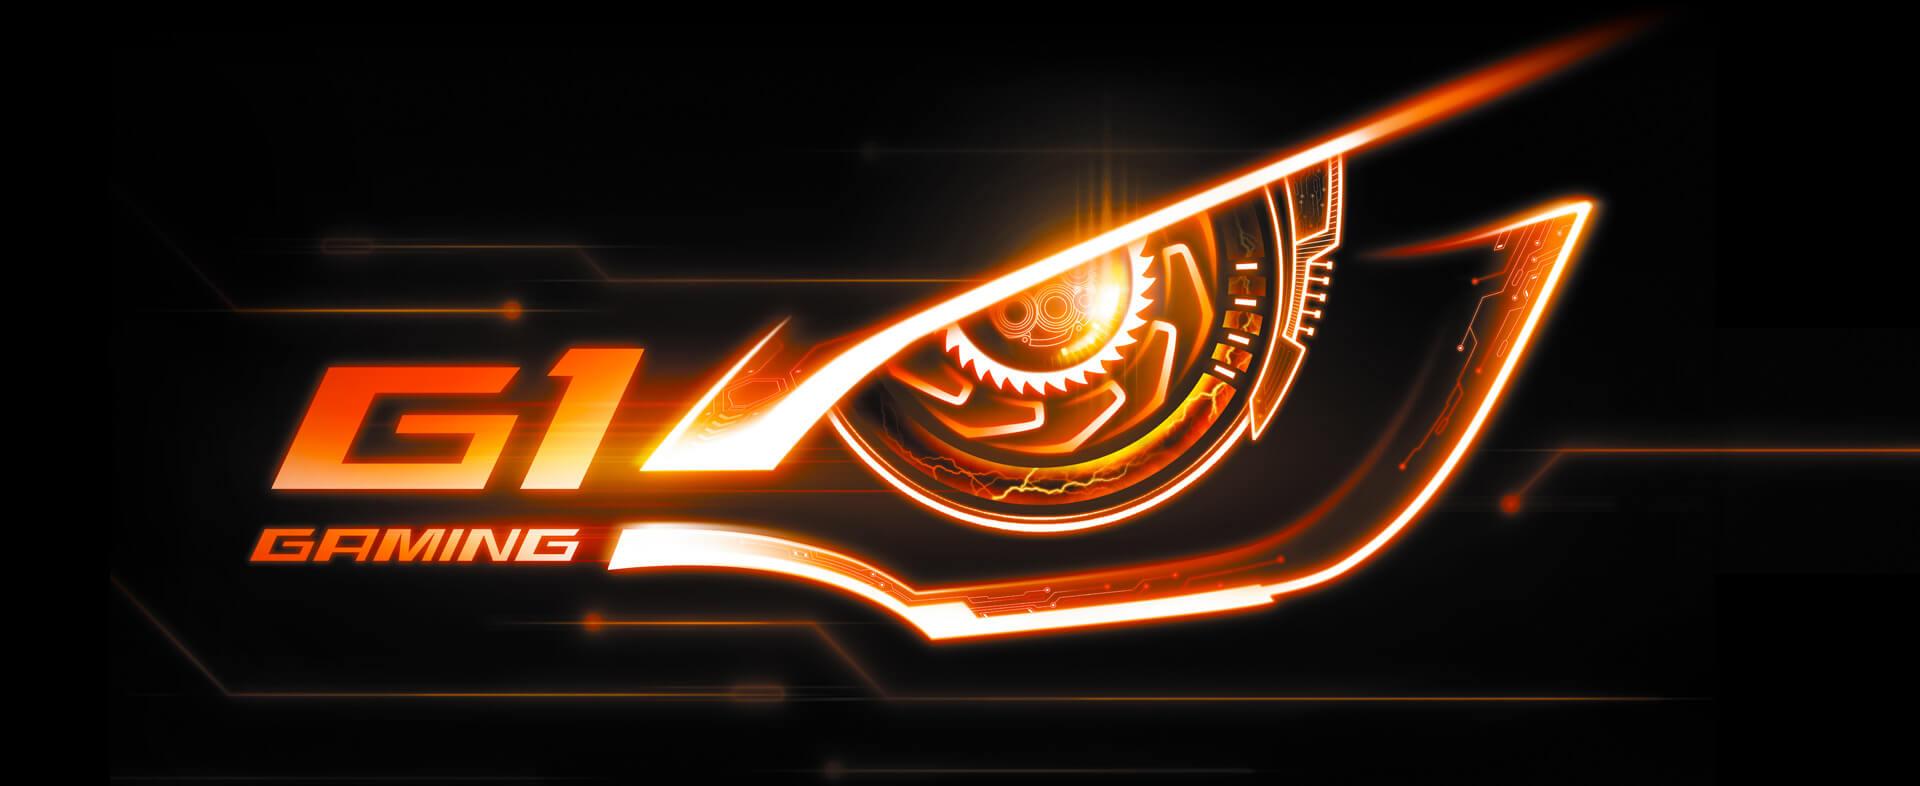 GeForce® GTX 1080 G1 Gaming 8G   Graphics Card - GIGABYTE Global